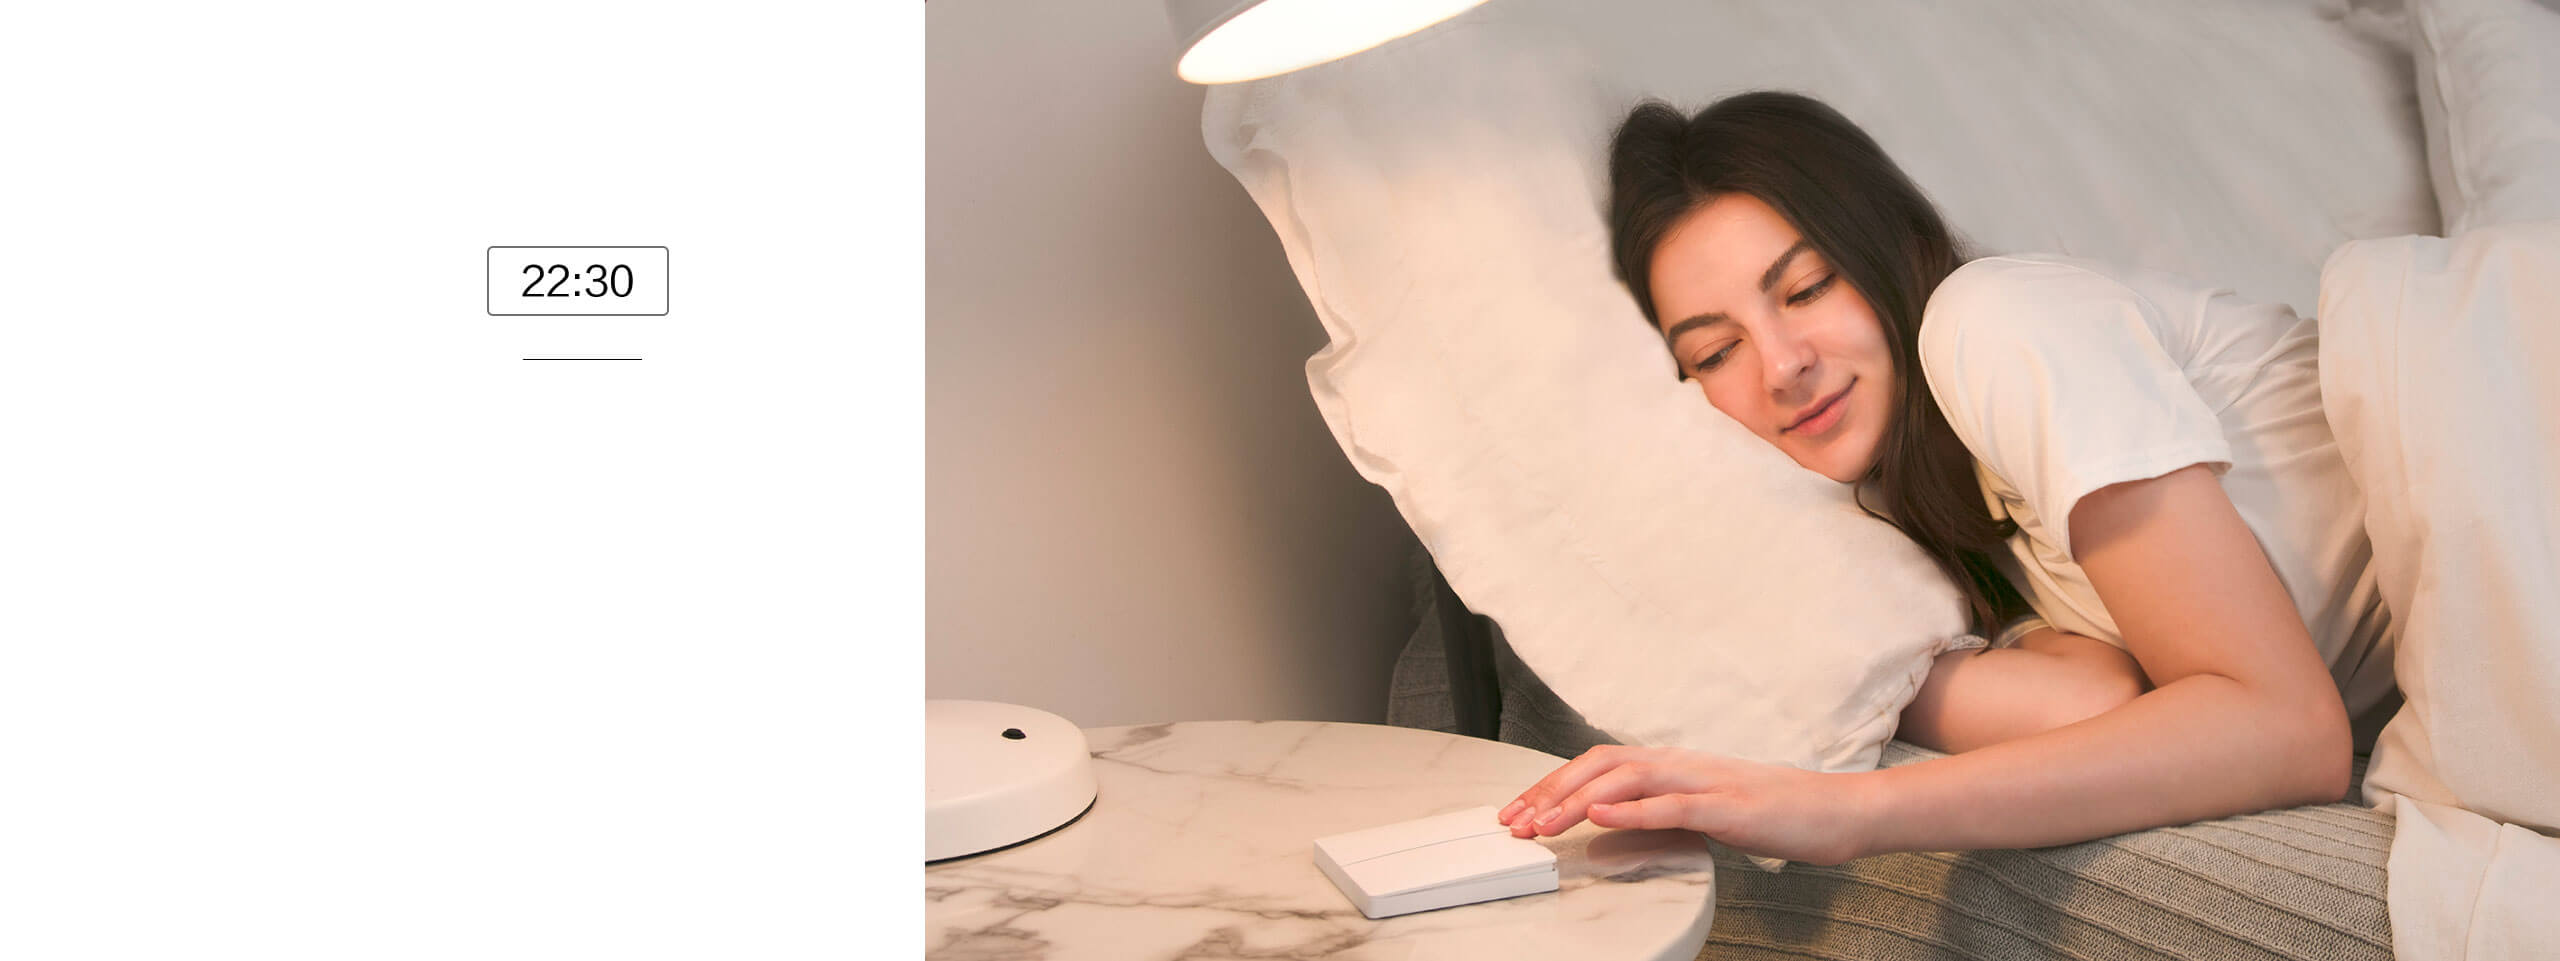 Aqara 智能无线开关 - 自定义睡眠模式